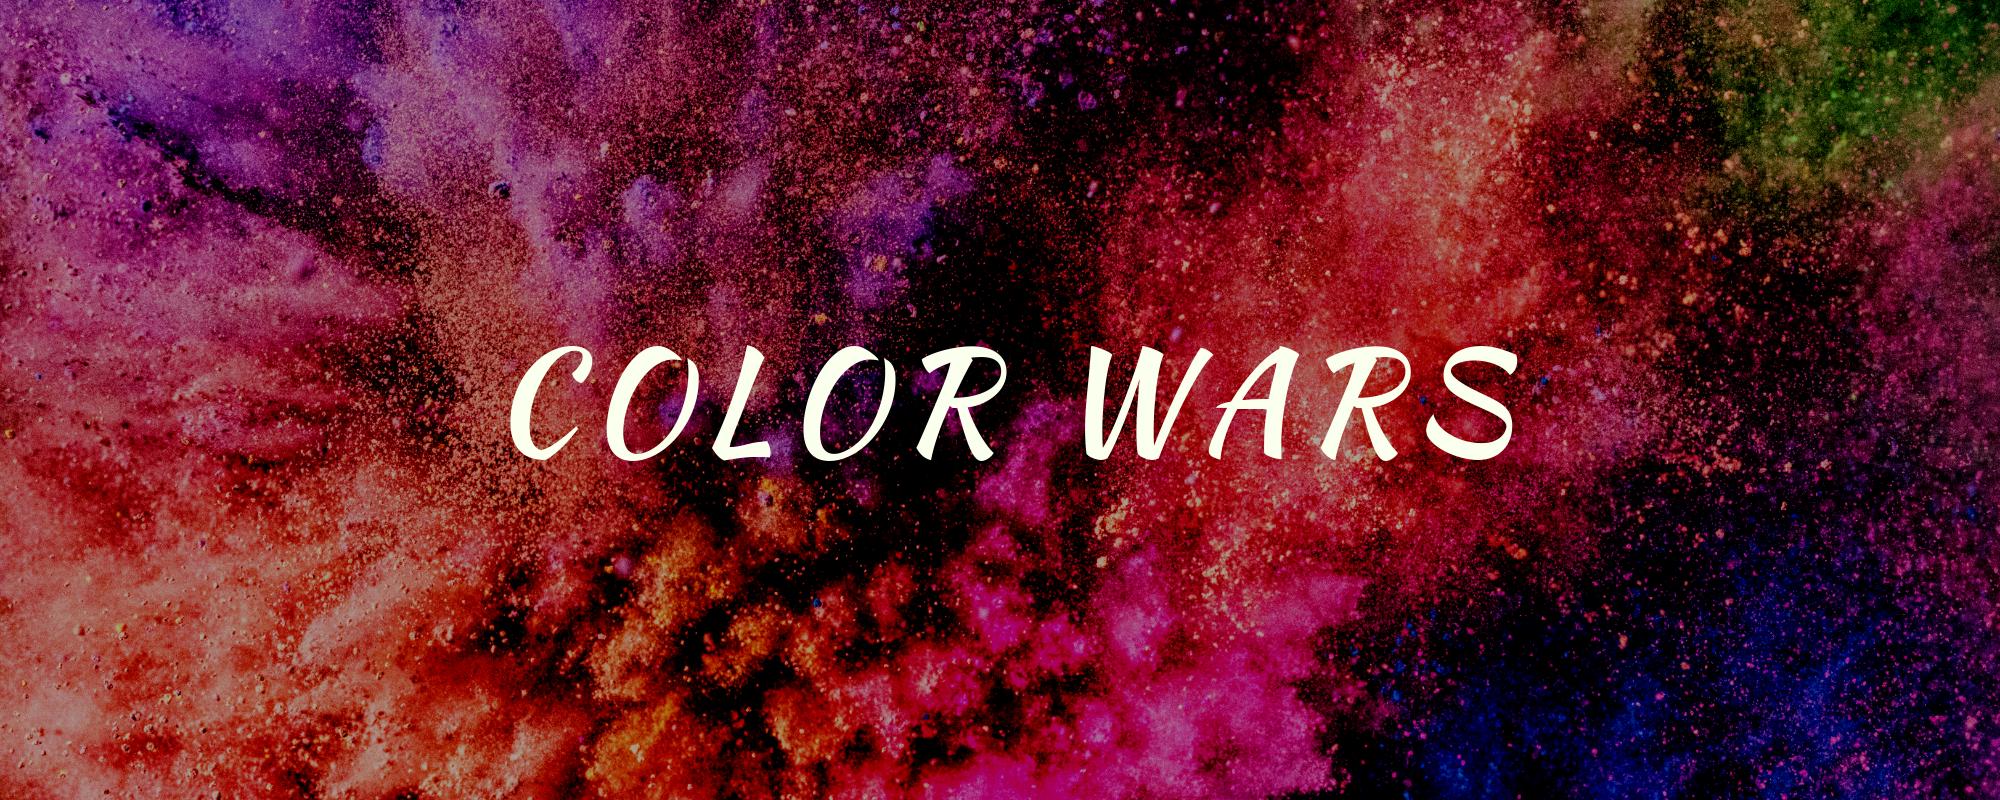 Copy of Copy of color wars.png